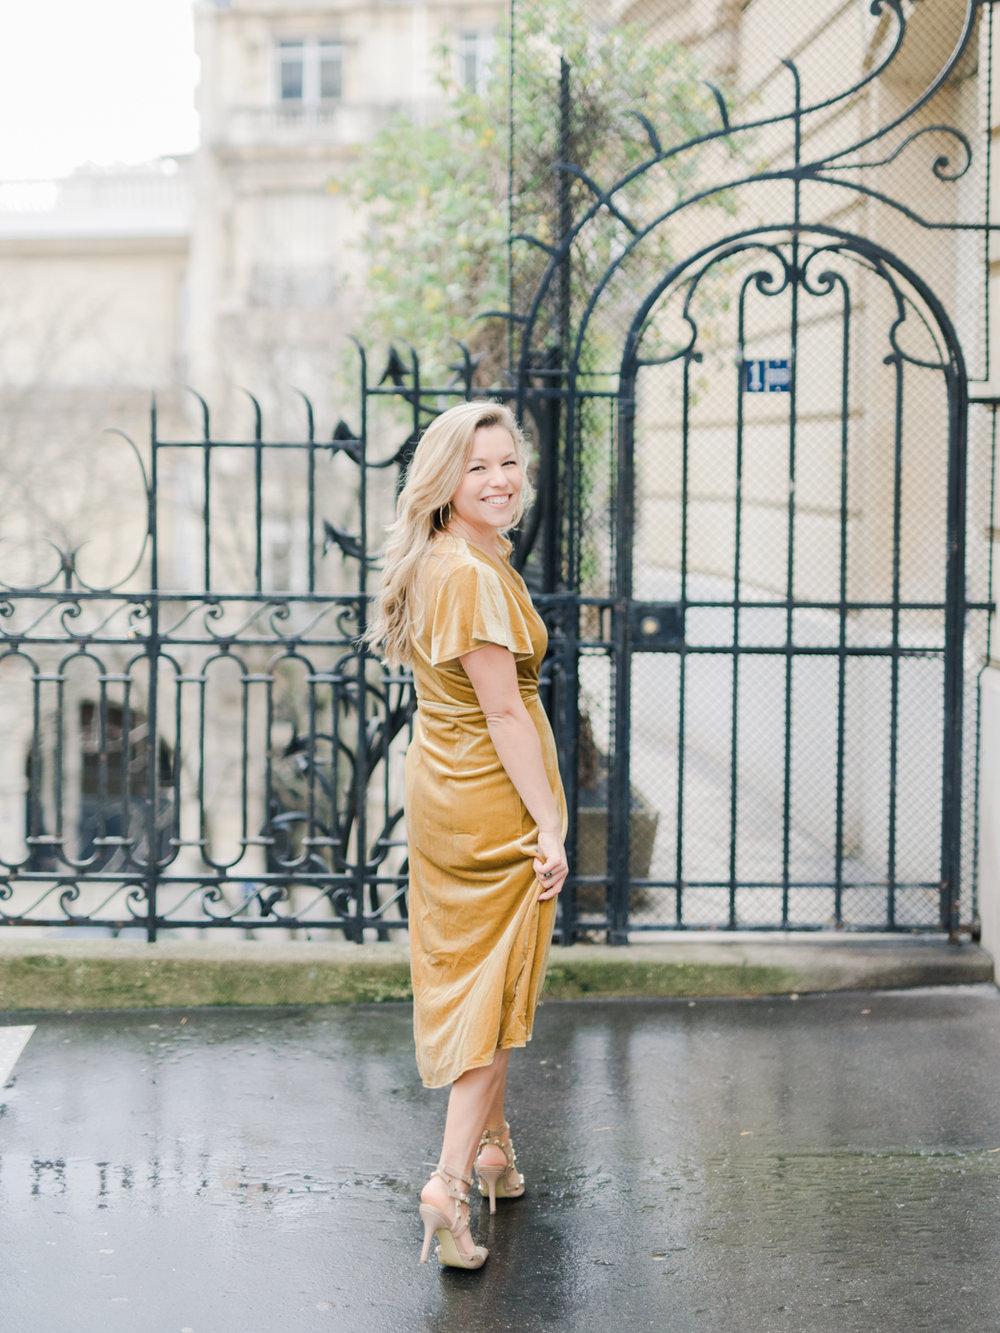 Parisian_Love_Shoot_Wedding_Photographer_Paris_Eiffel_Tower-9.jpg